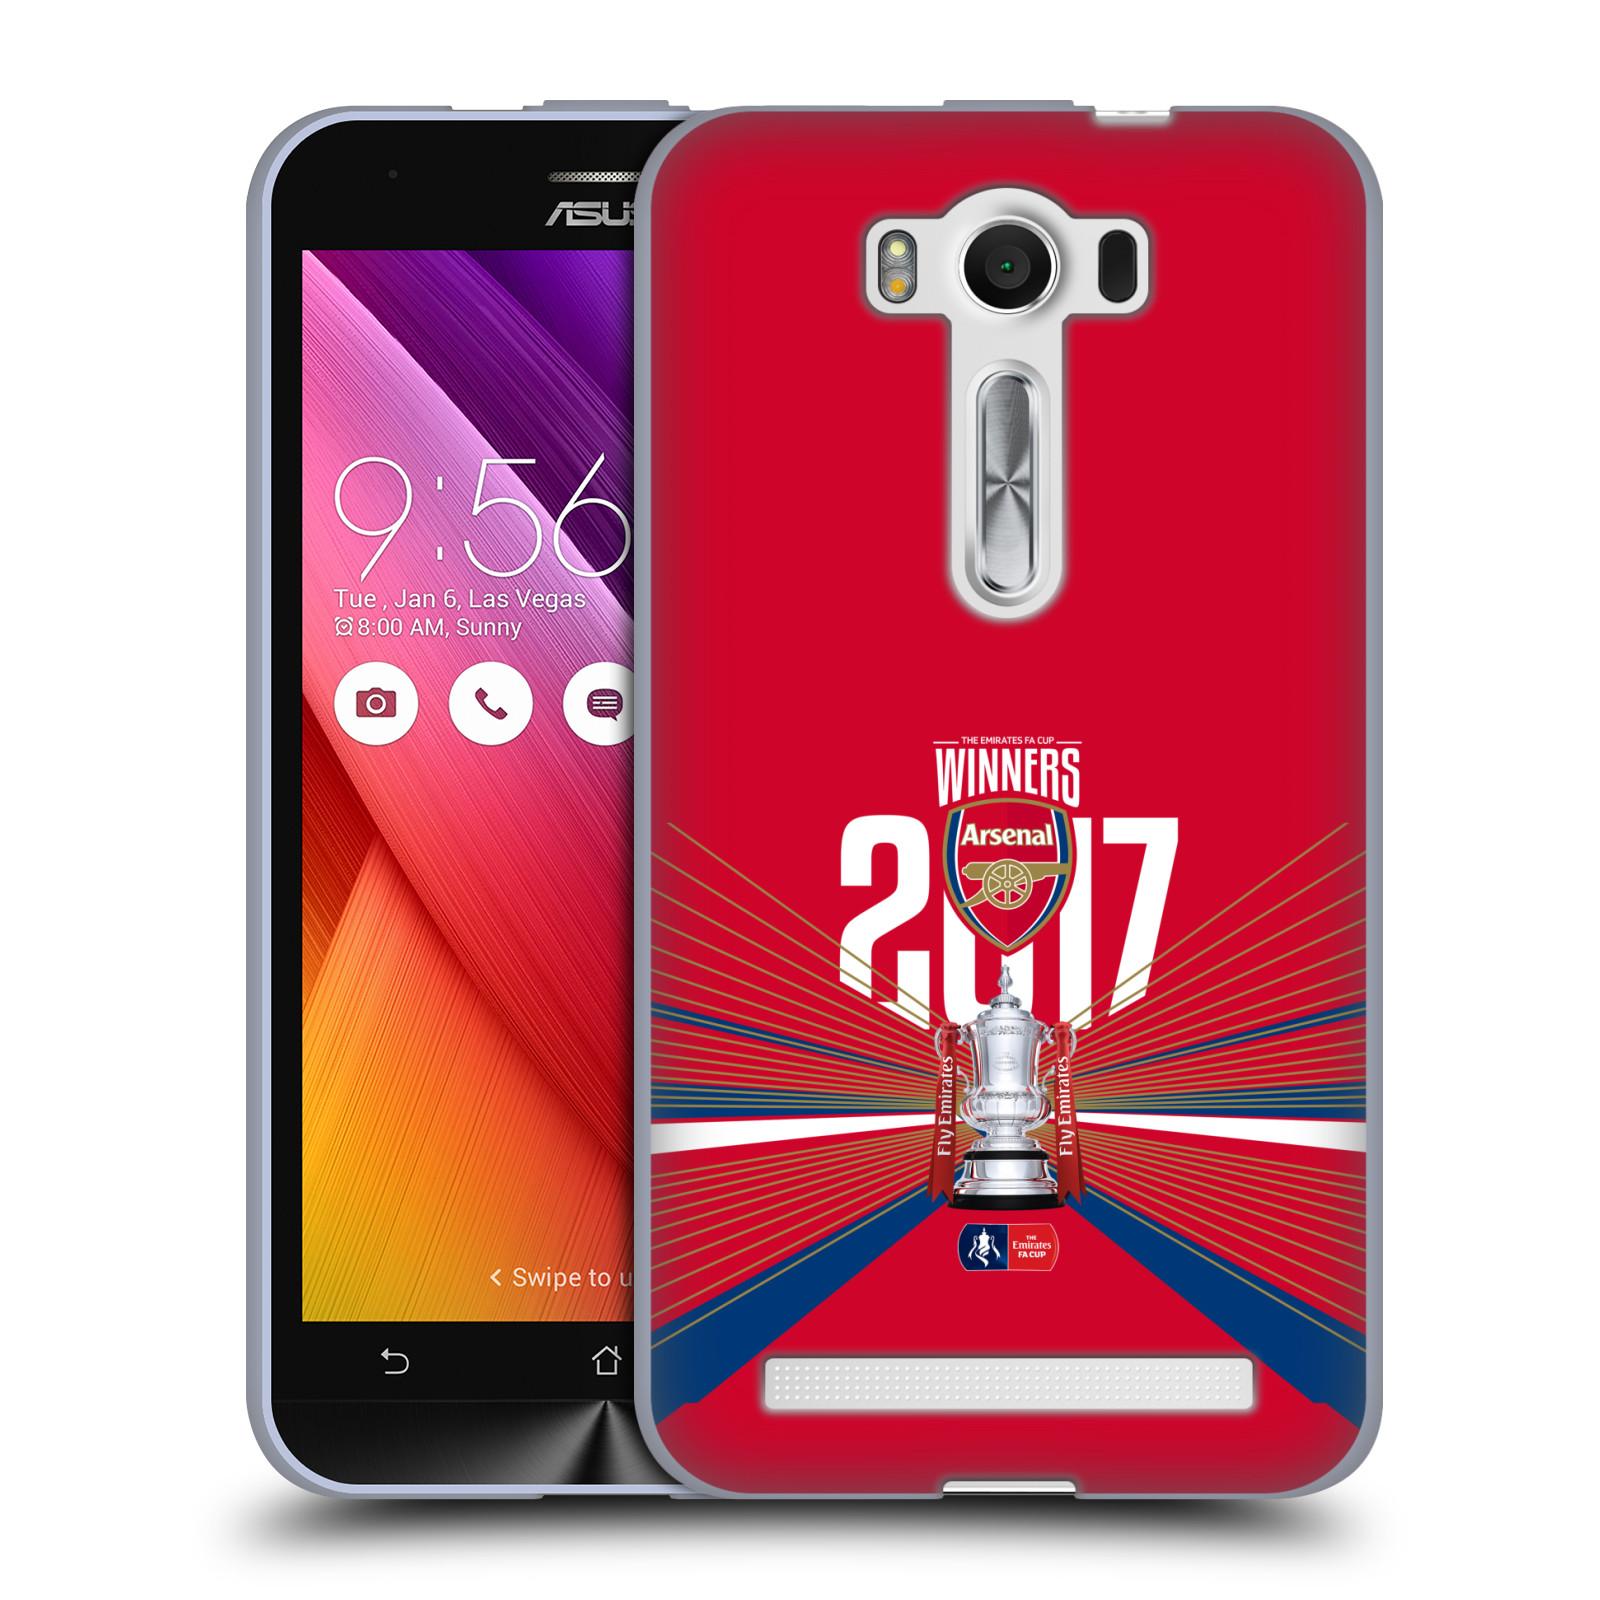 Silikonové pouzdro na mobil Asus ZenFone 2 Laser ZE500KL - Head Case - Arsenal FC - Trophy